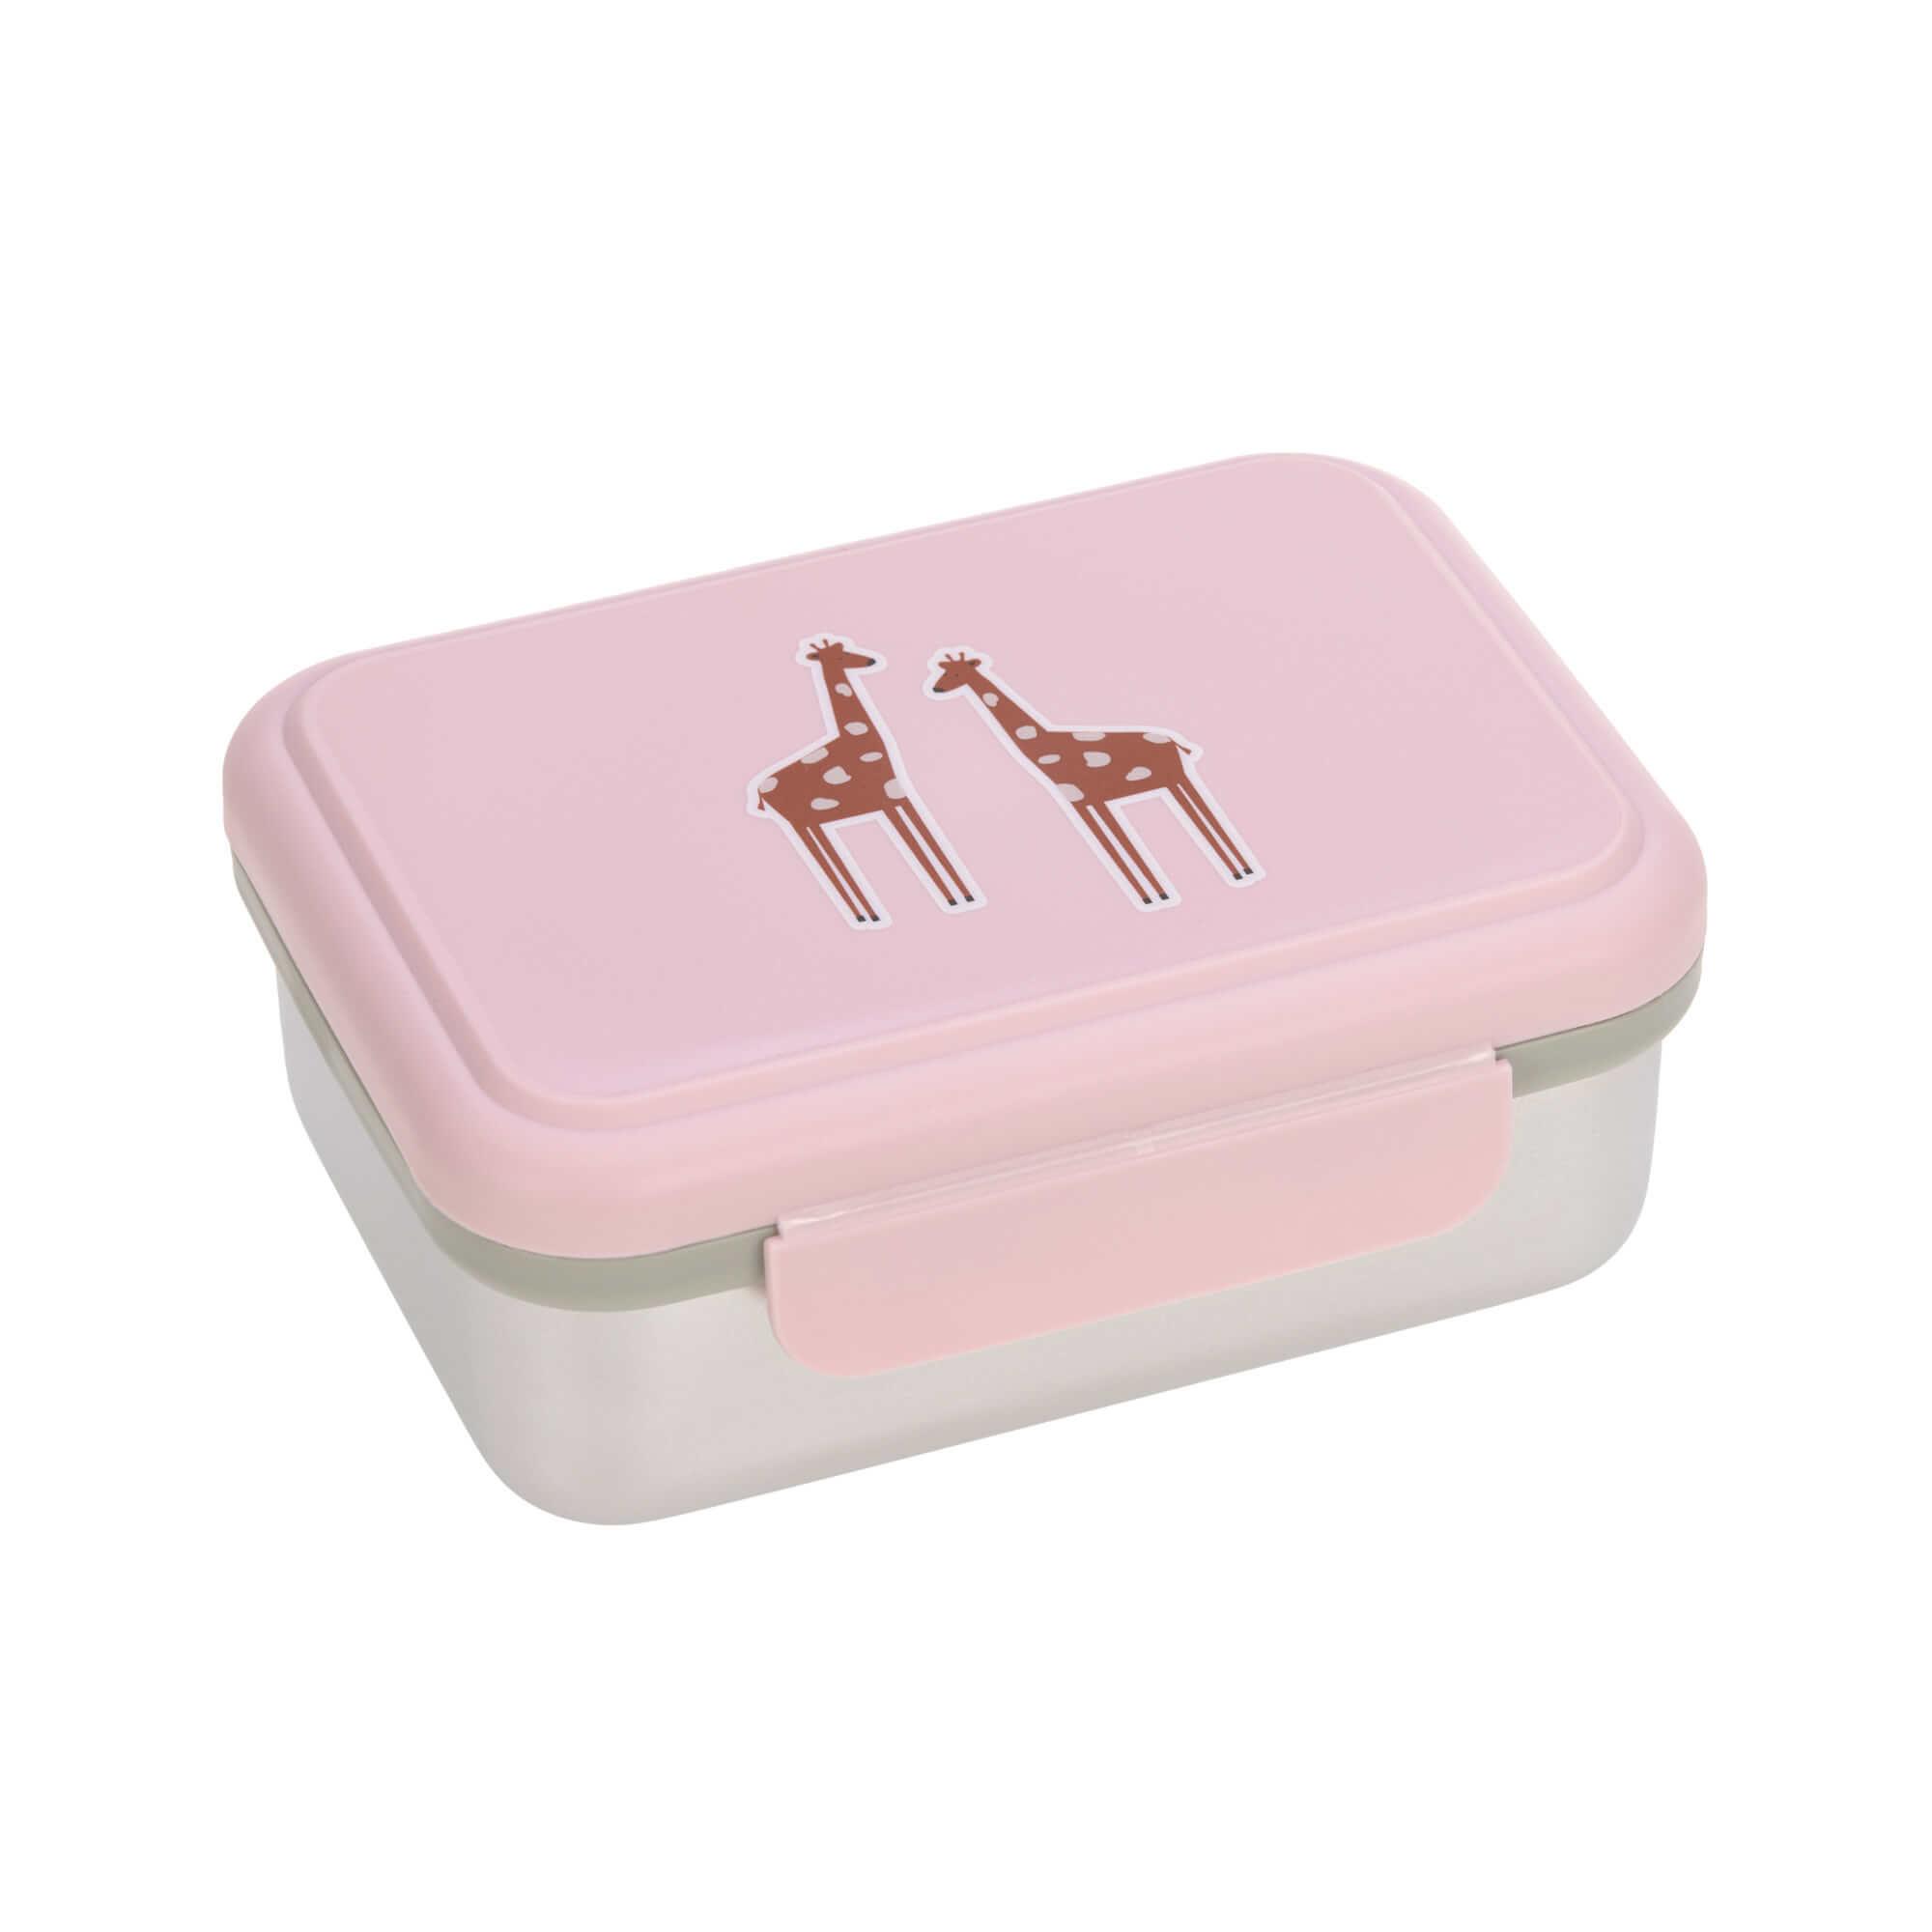 Lässig Lunchbox Stainless Steel Safari Giraffe